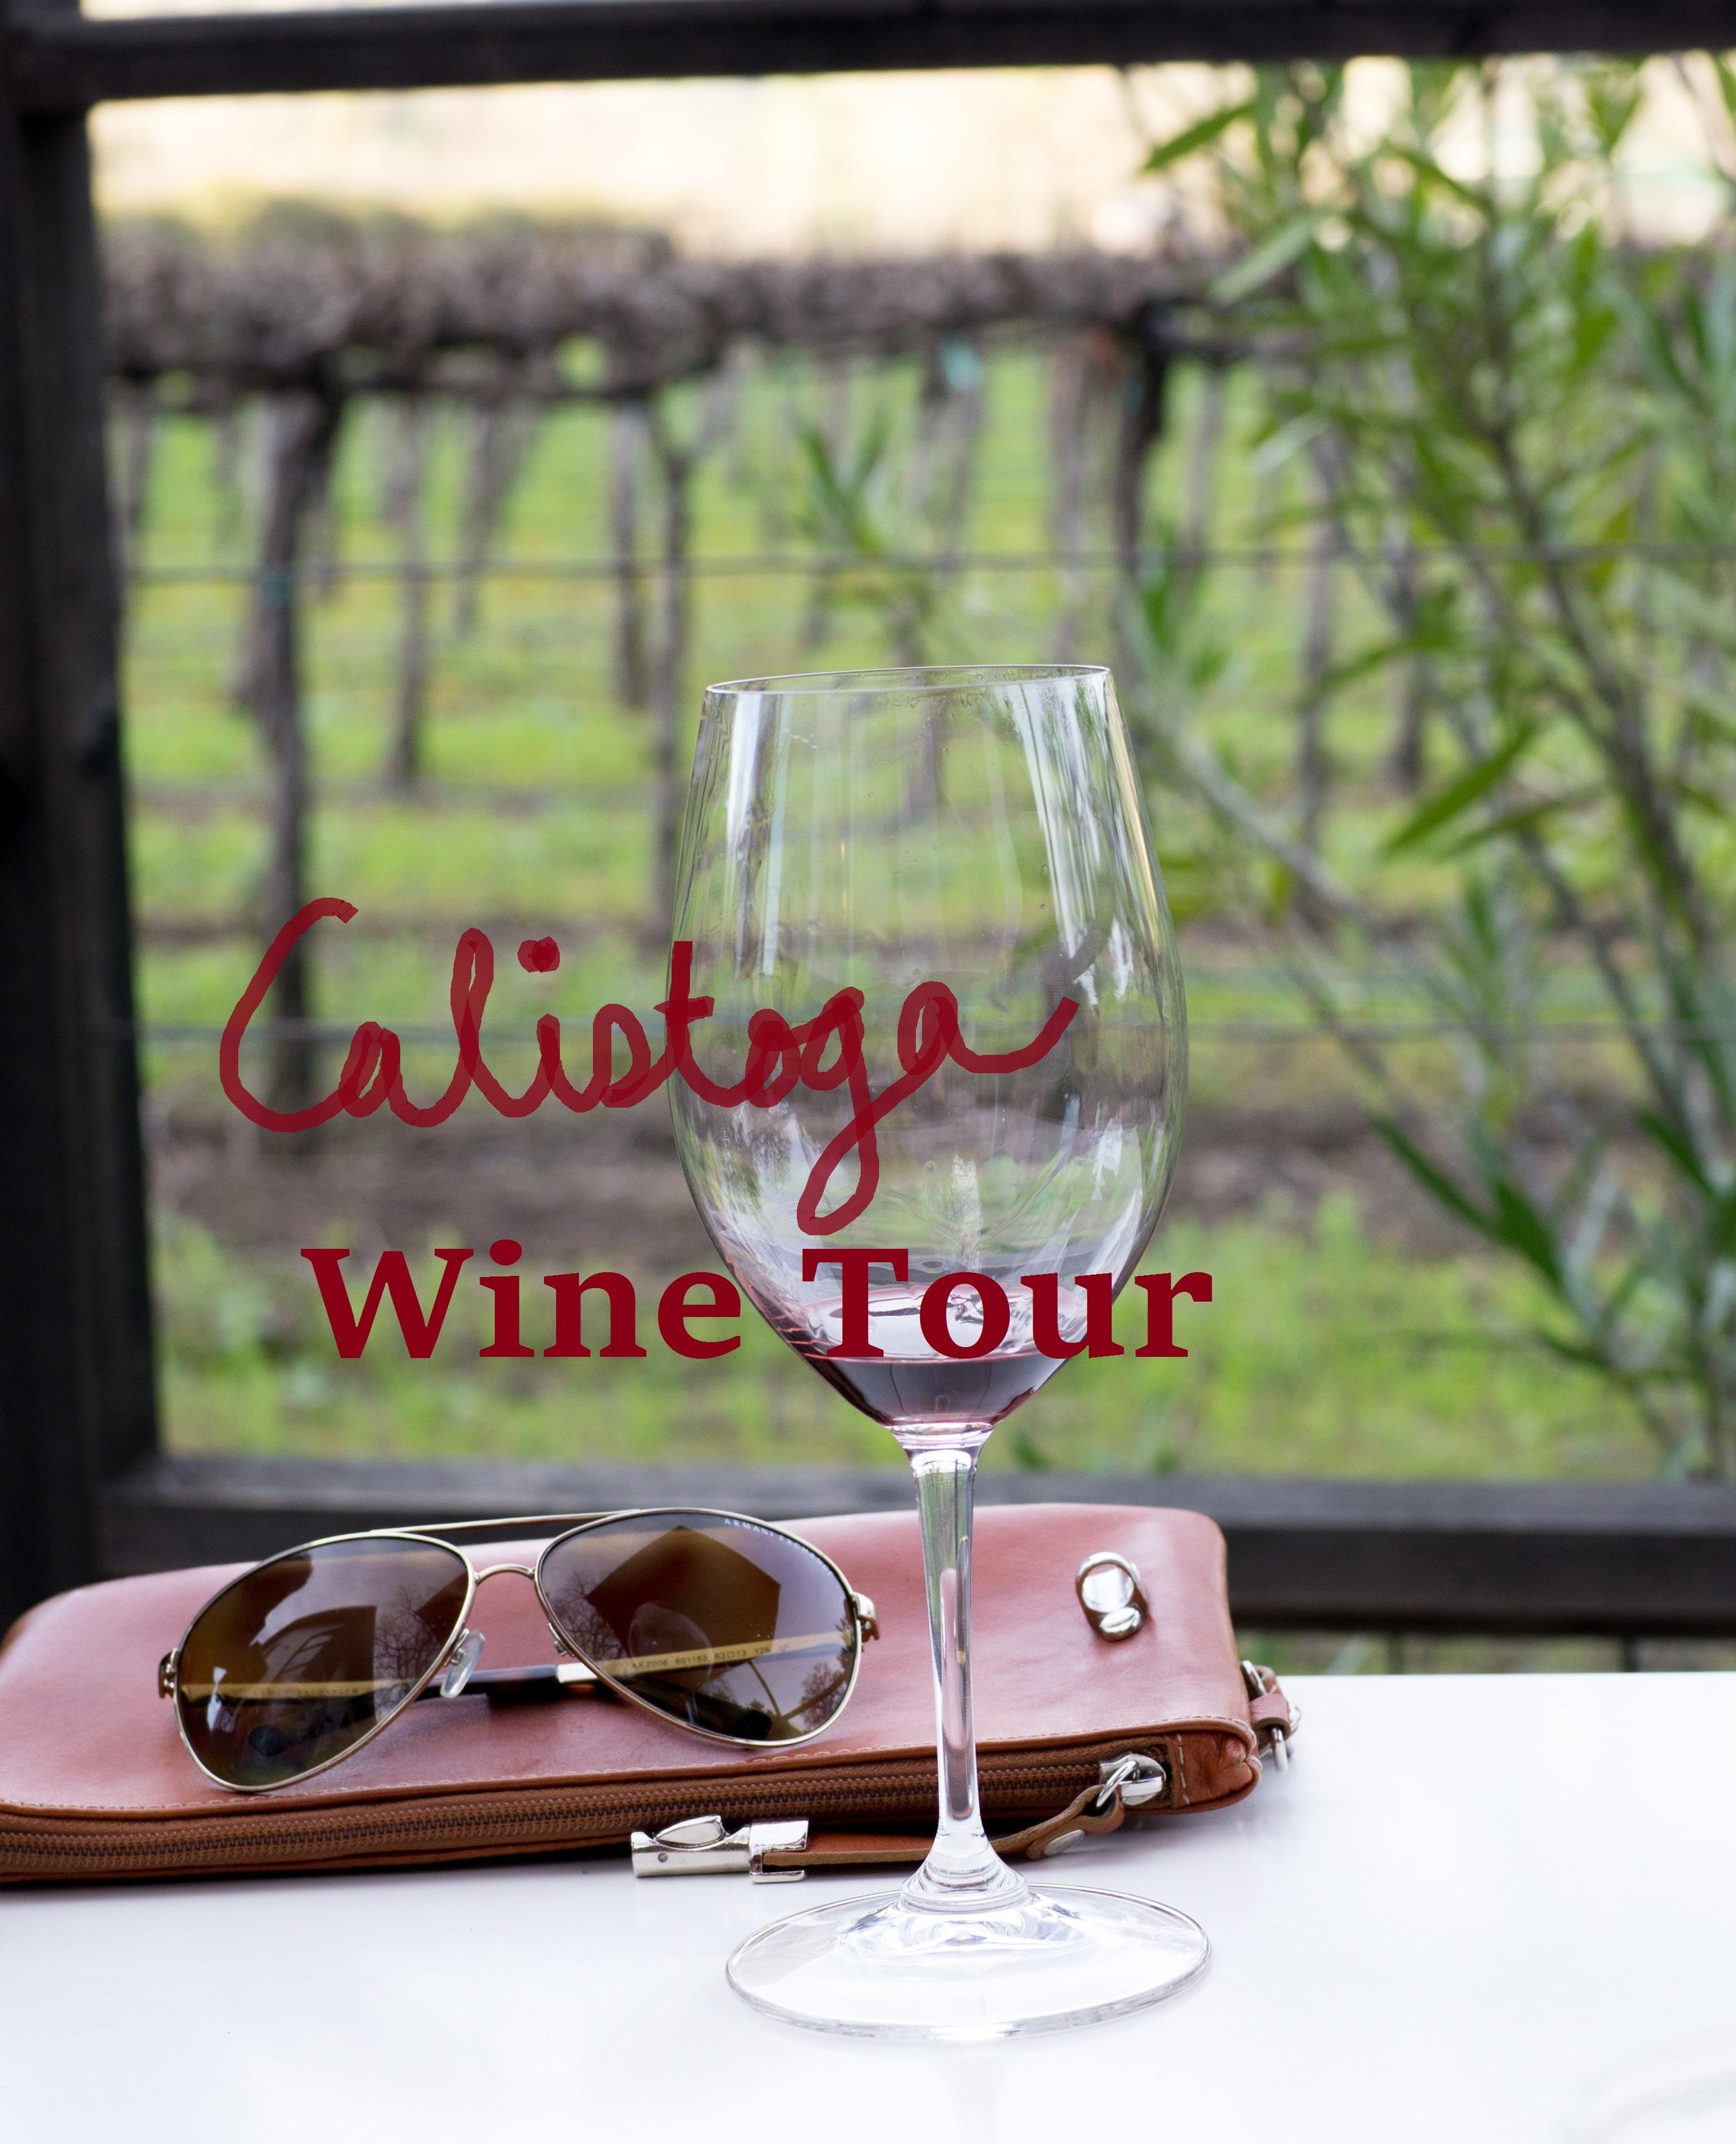 calistoga-wine-tour